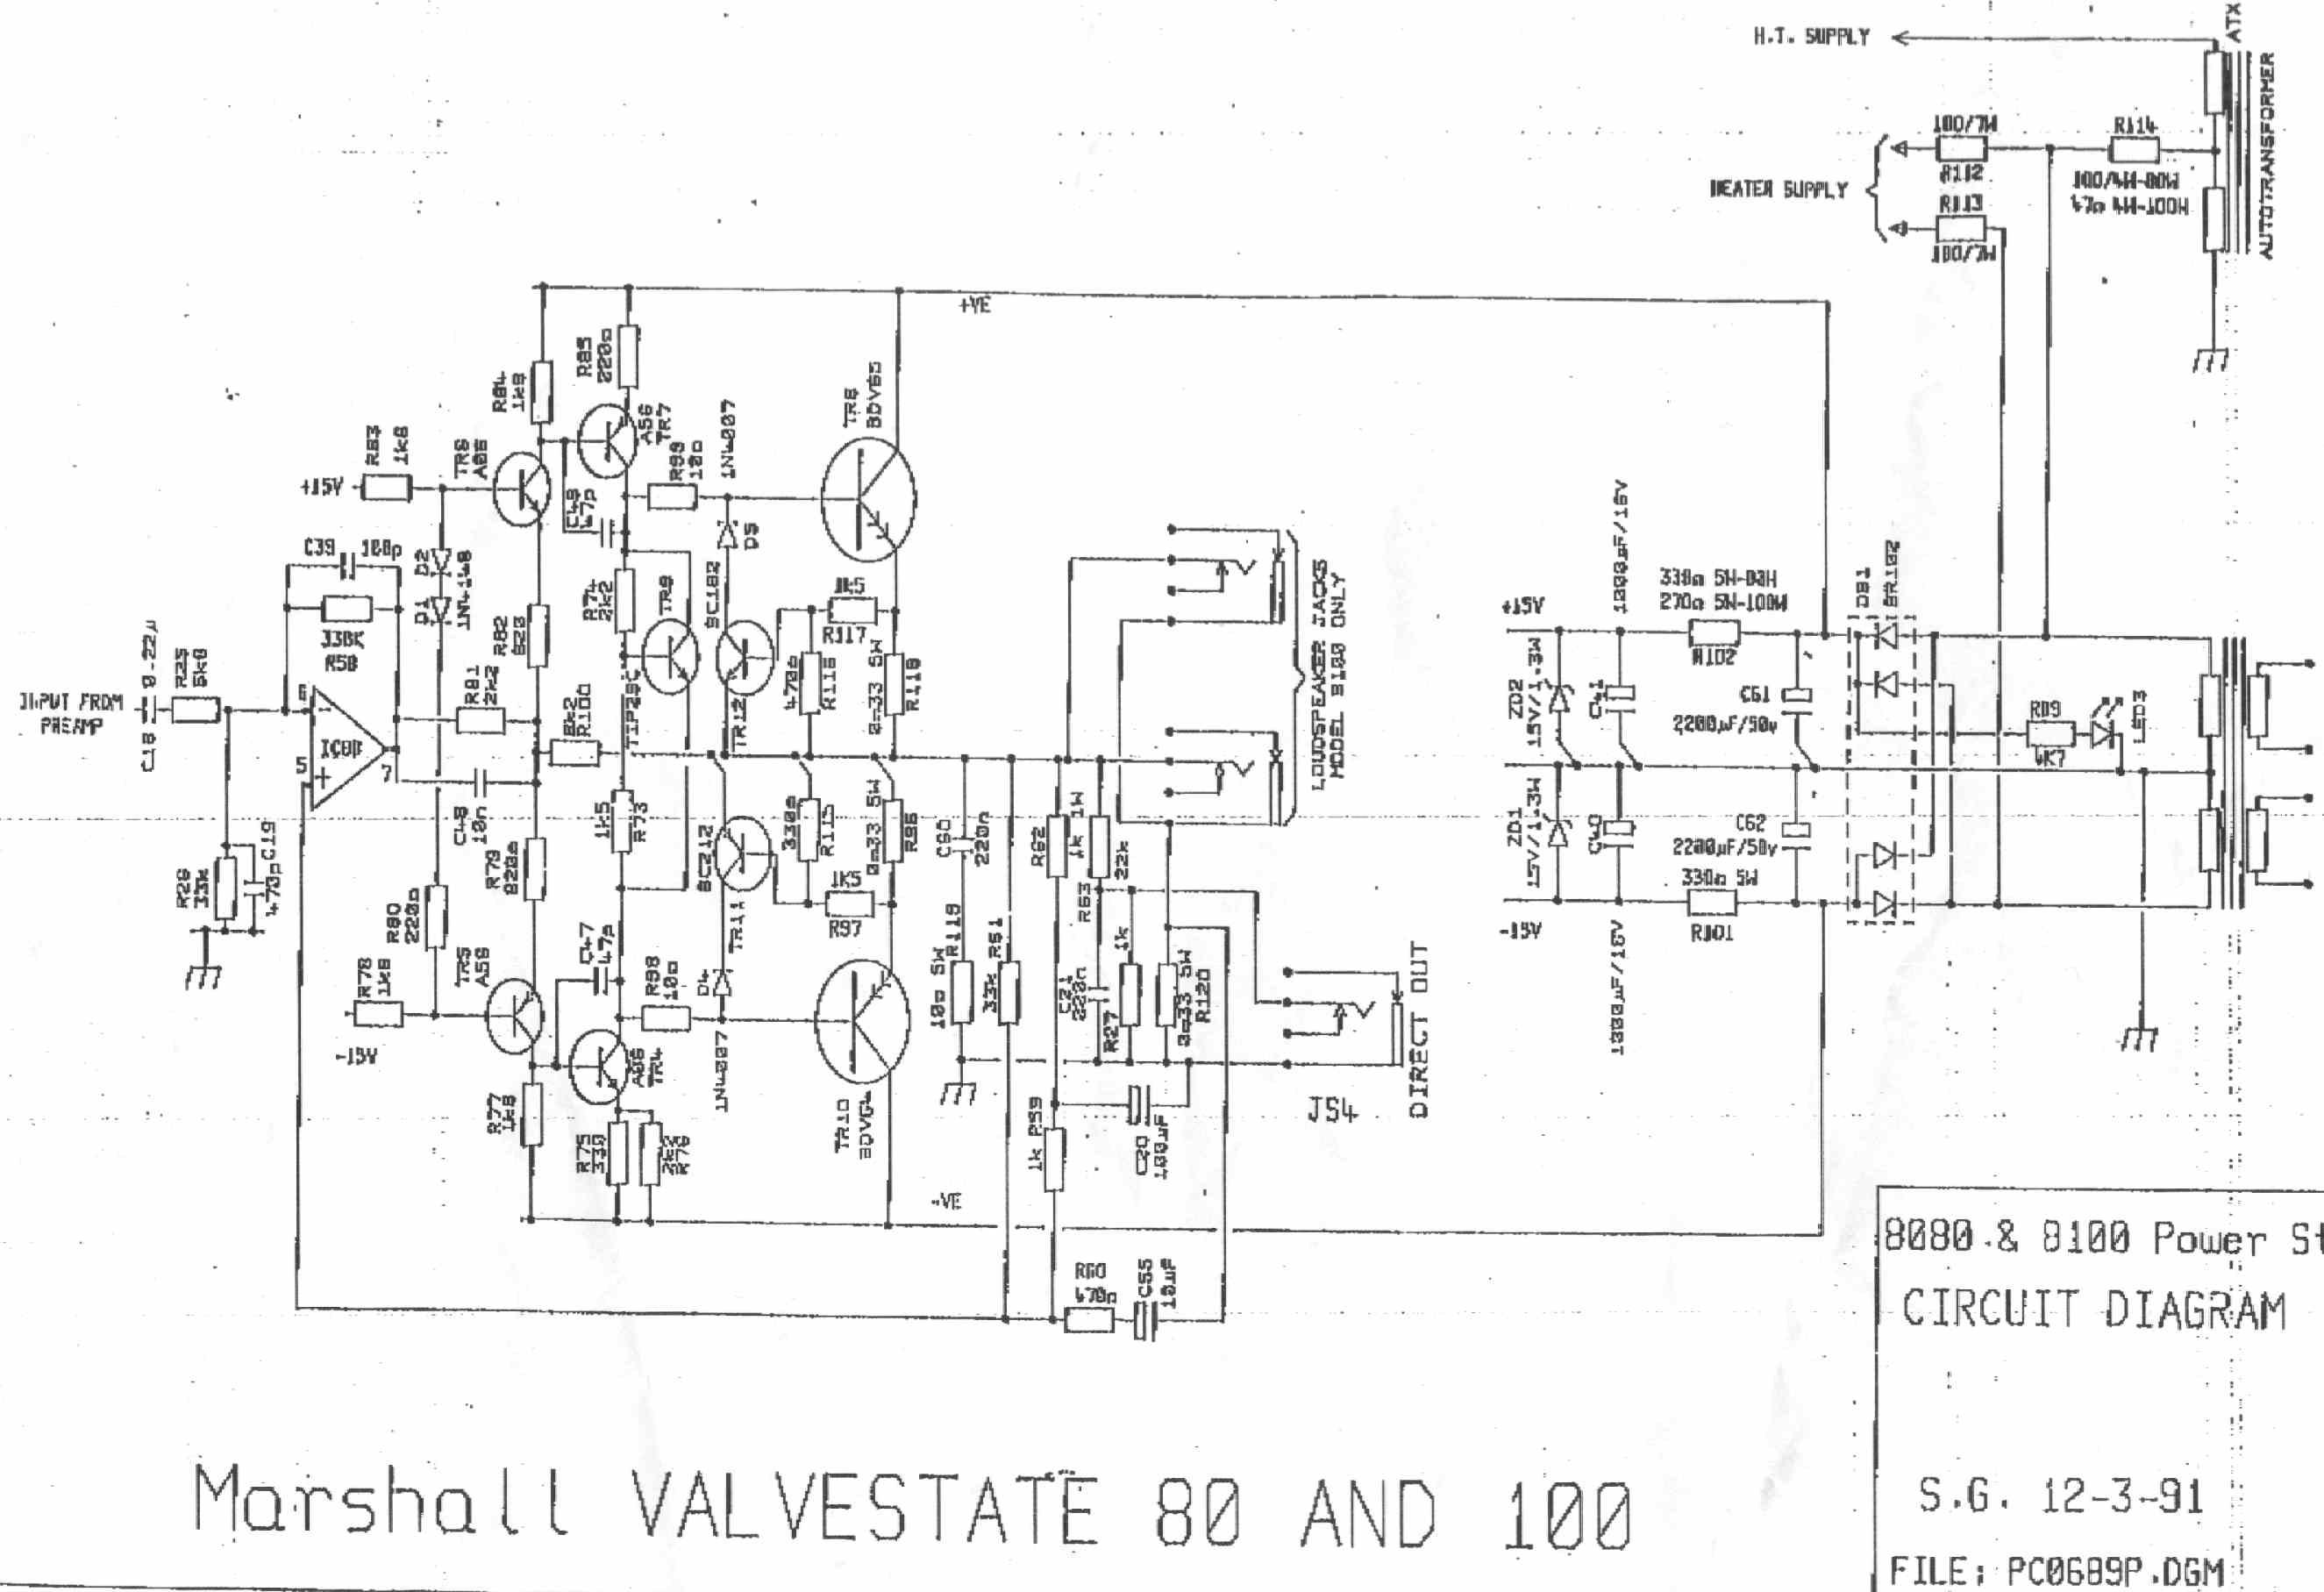 Index Of 2 Schematics Music Amps Marshall Valvestate